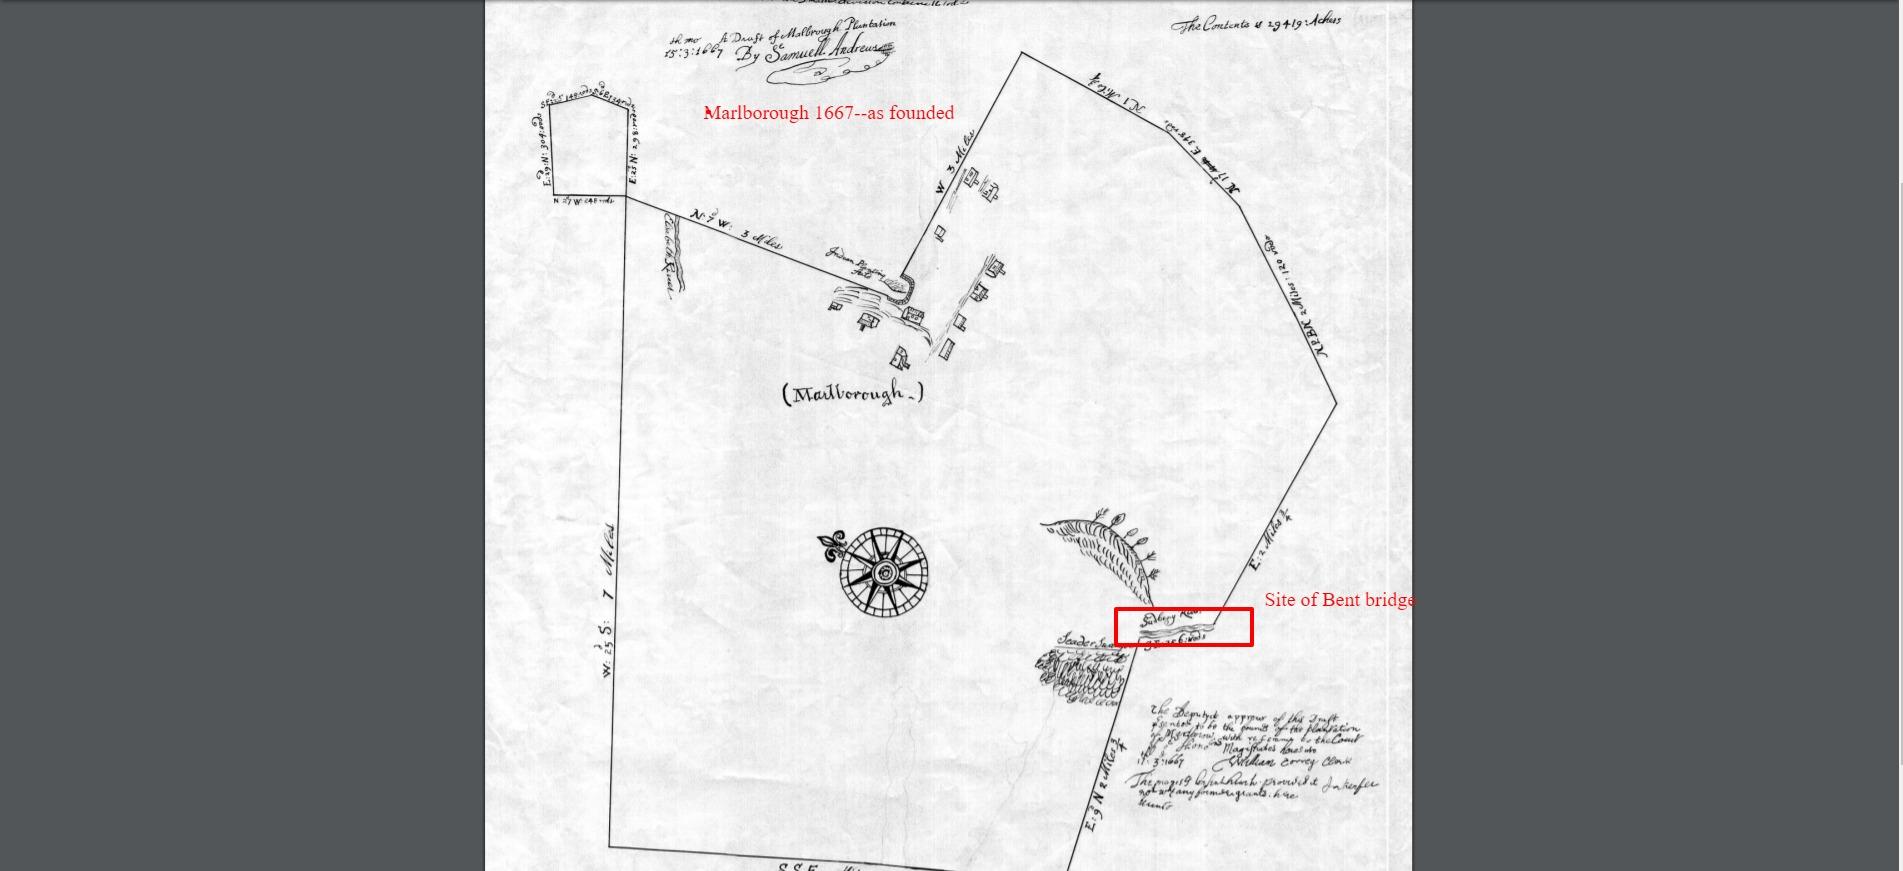 Peter Bent -Marloborough 1667